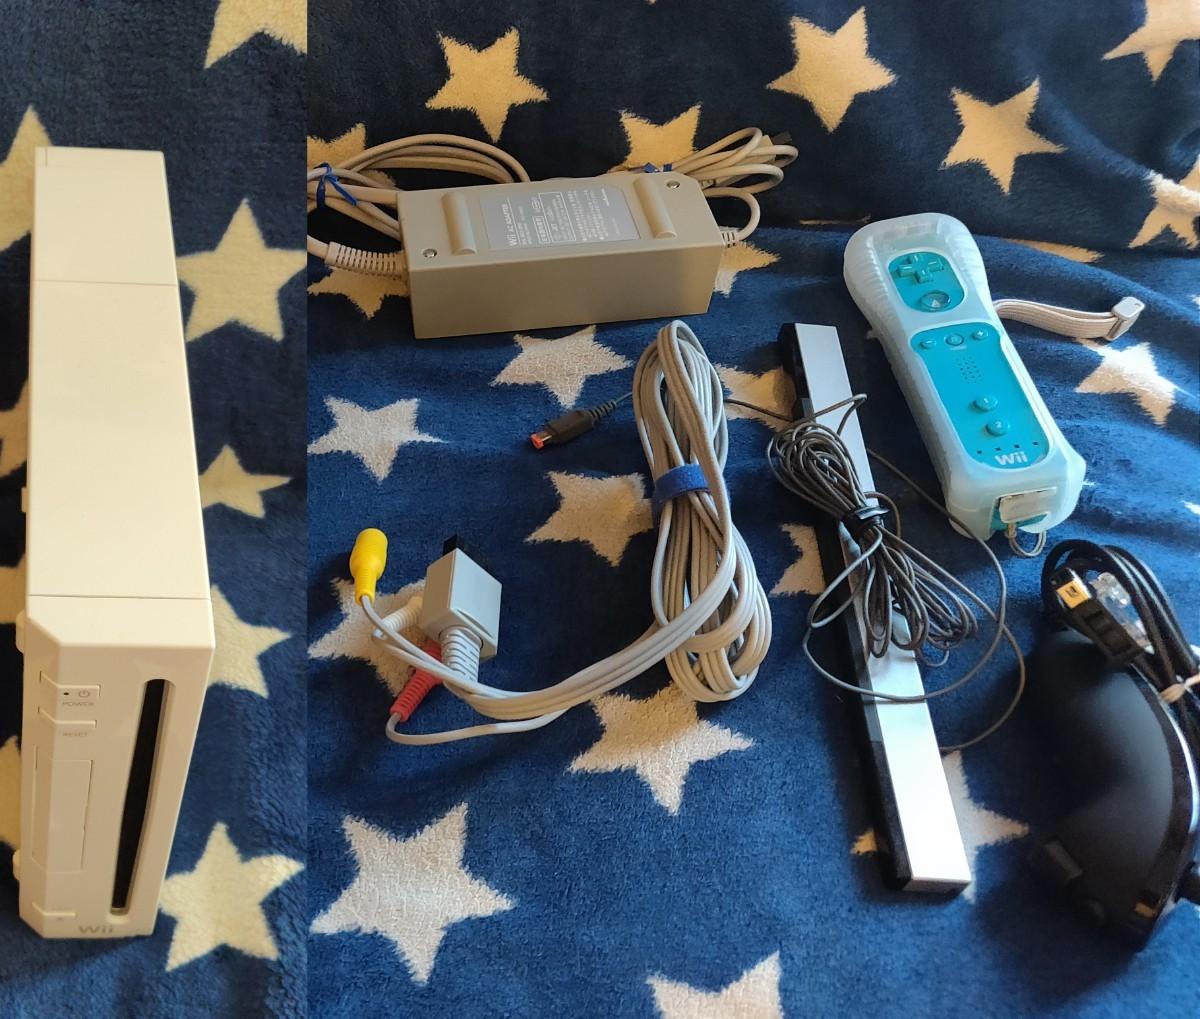 Nintendo Wii本体、リモコン モーションプラス、付属品一式 セット